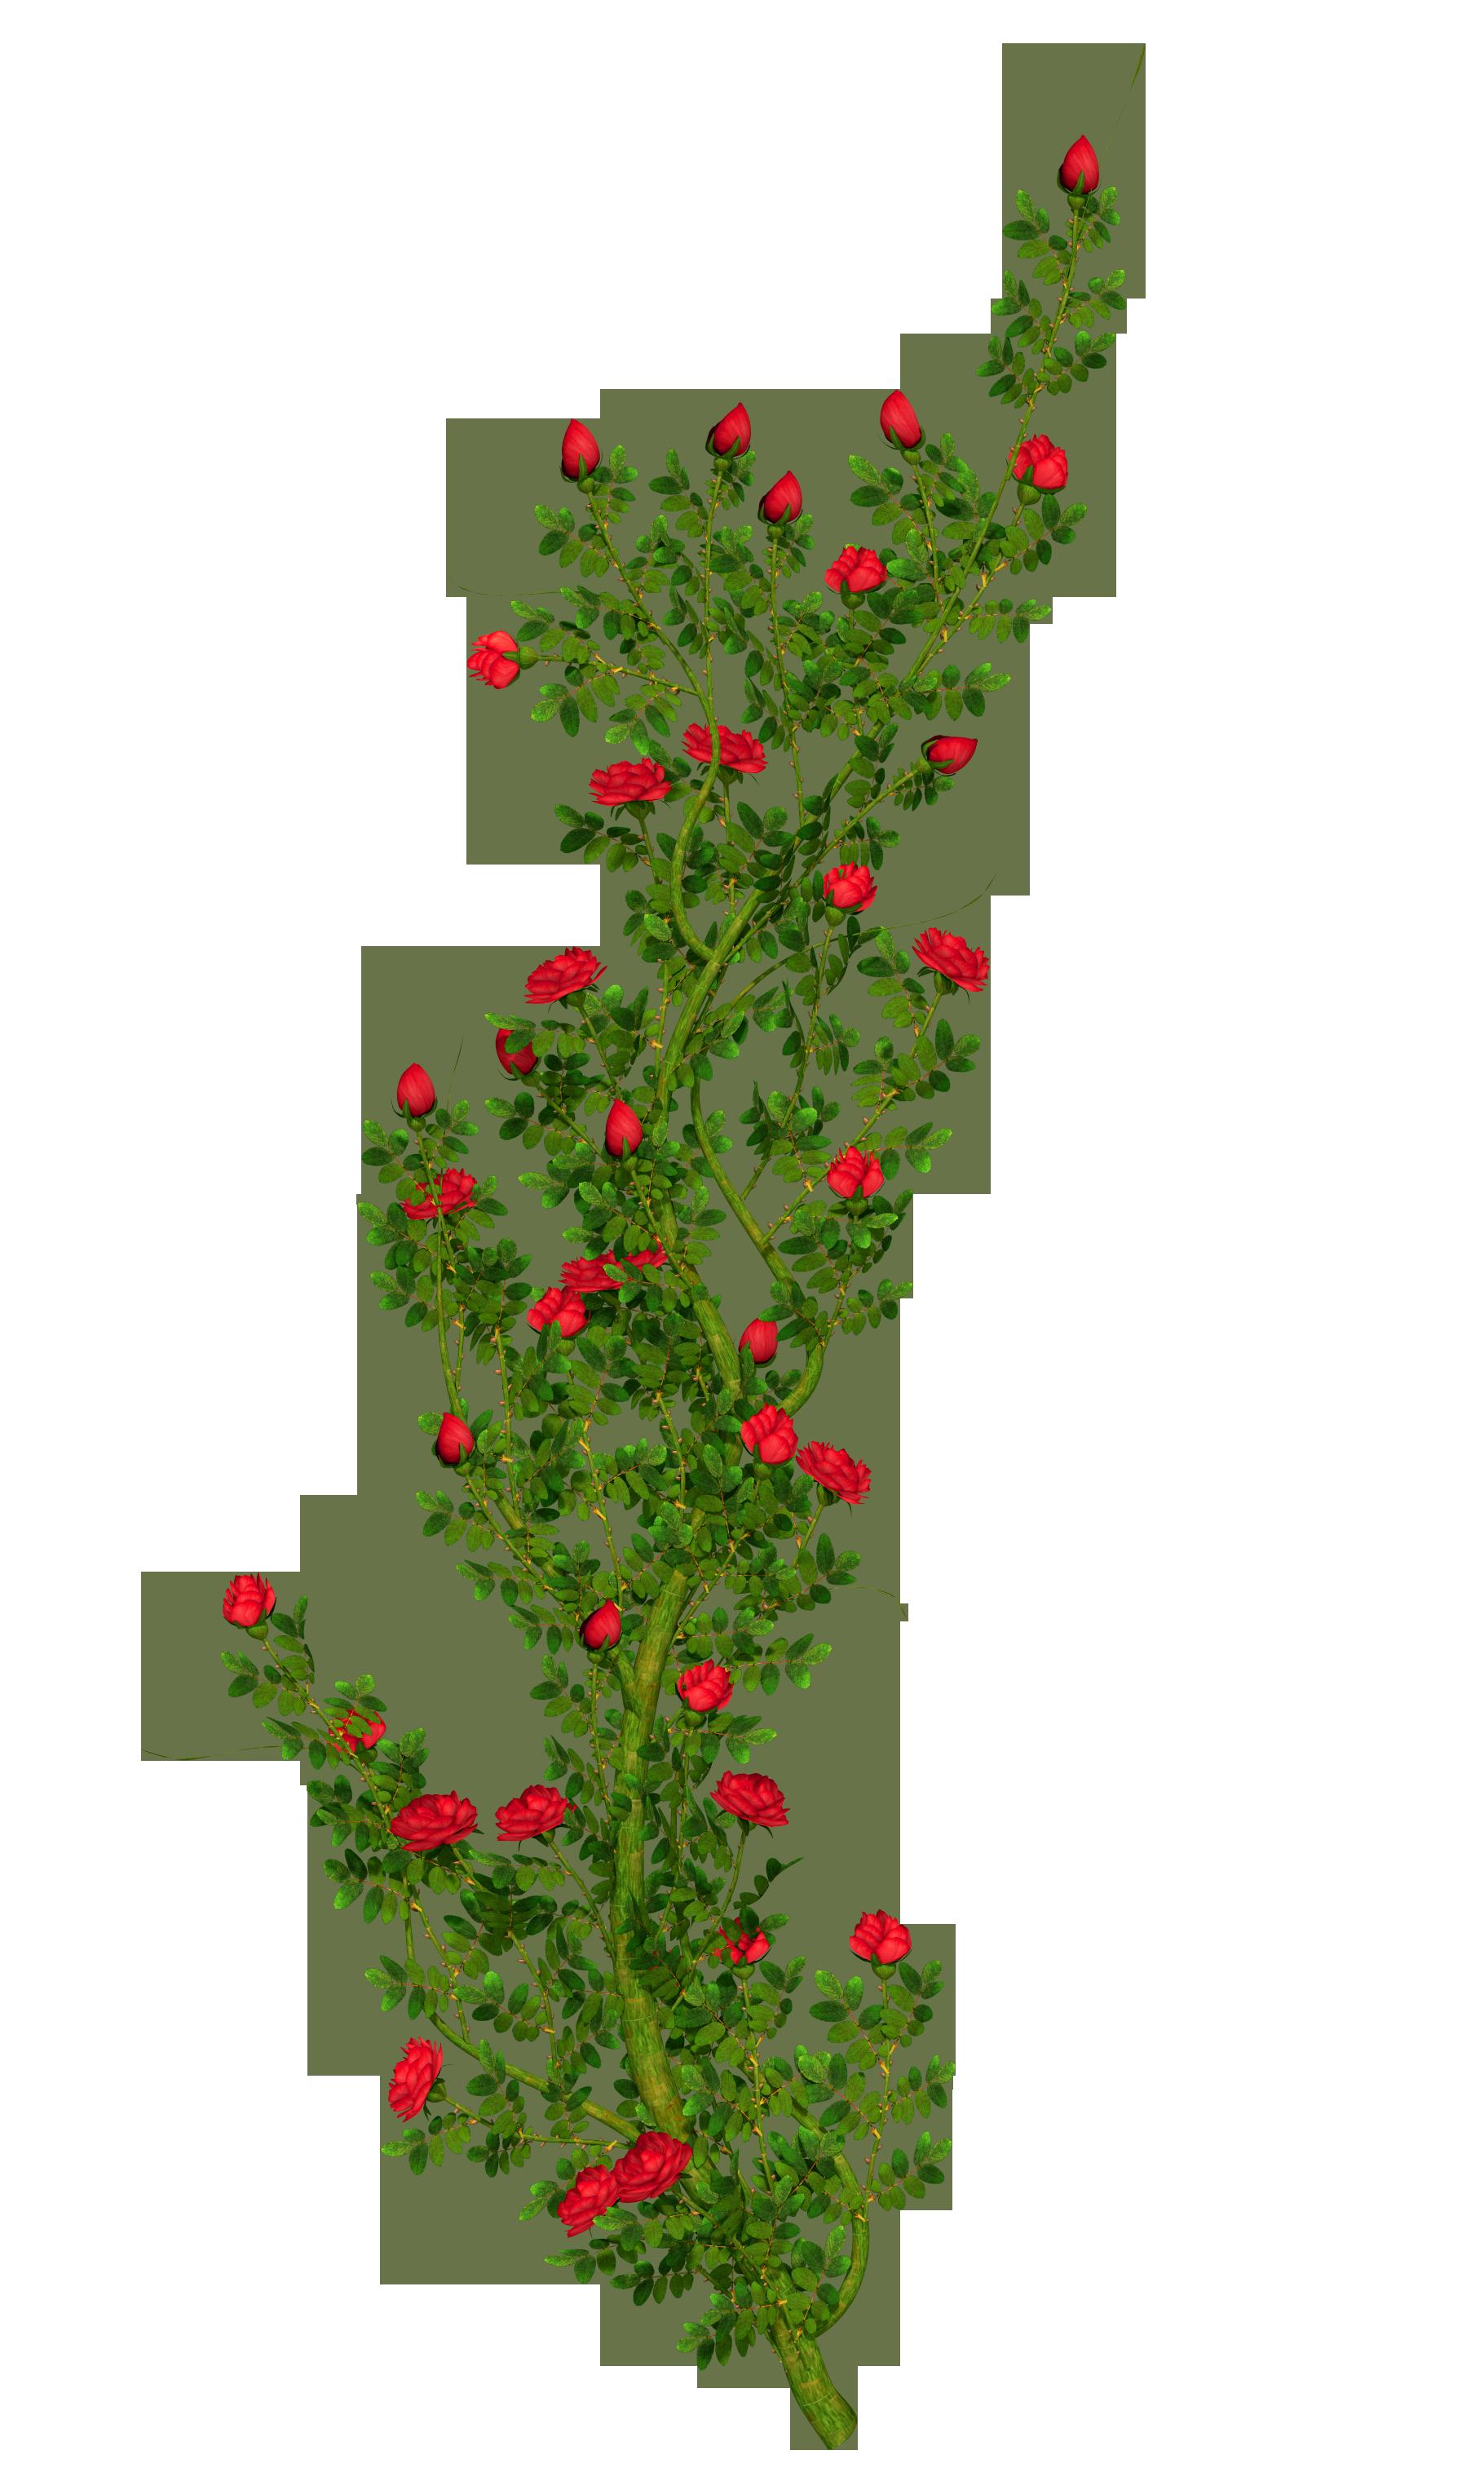 Rose clipart shrub. Rosebush gallery yopriceville high